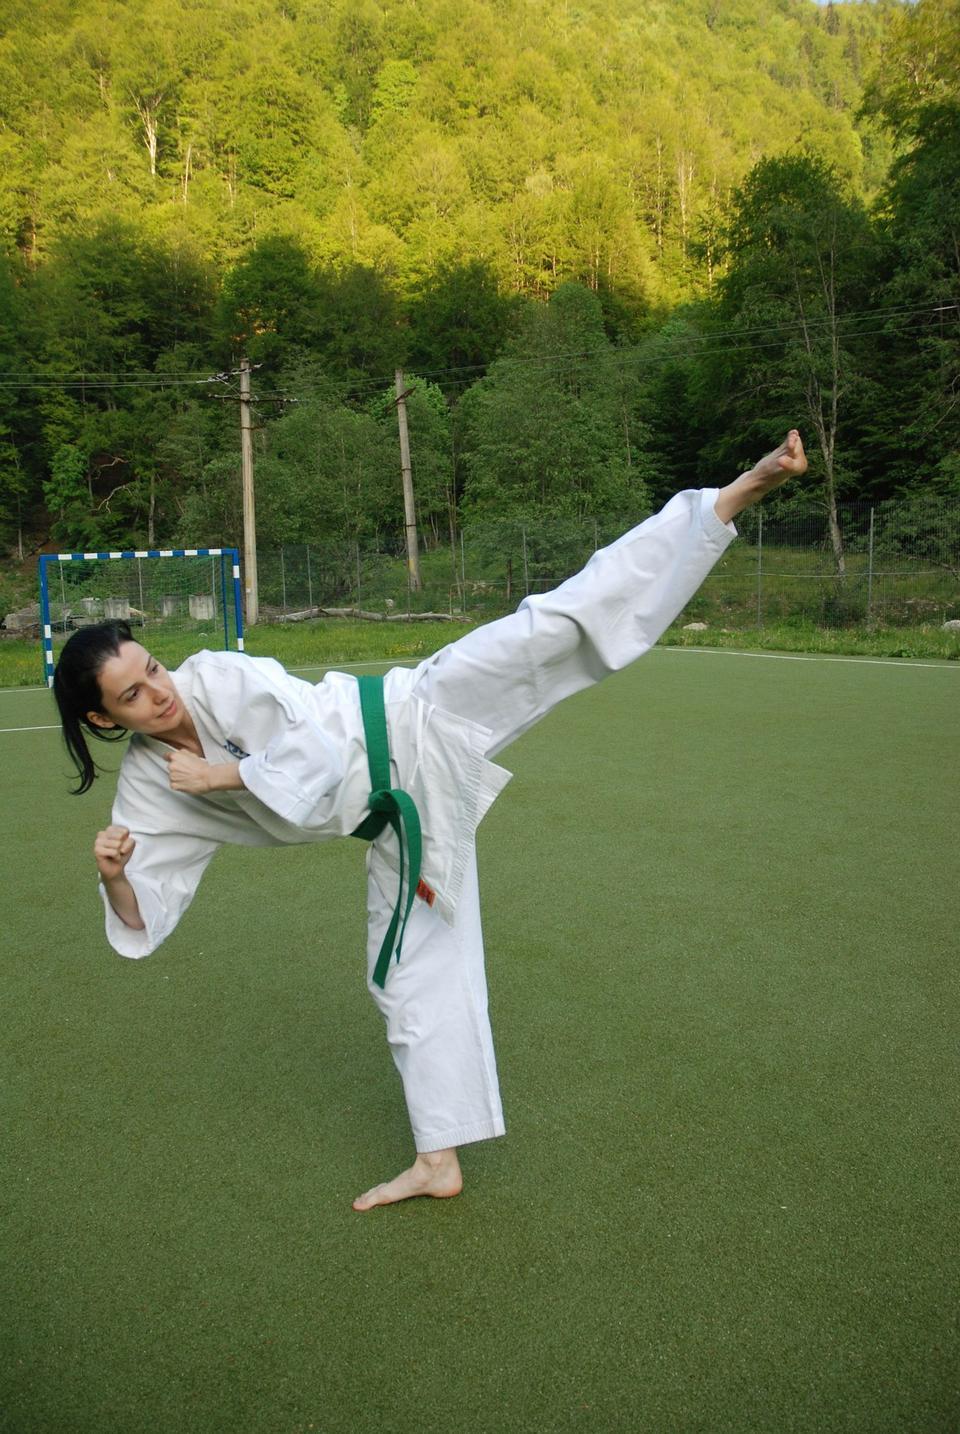 woman in kimono show marshal art foot kick